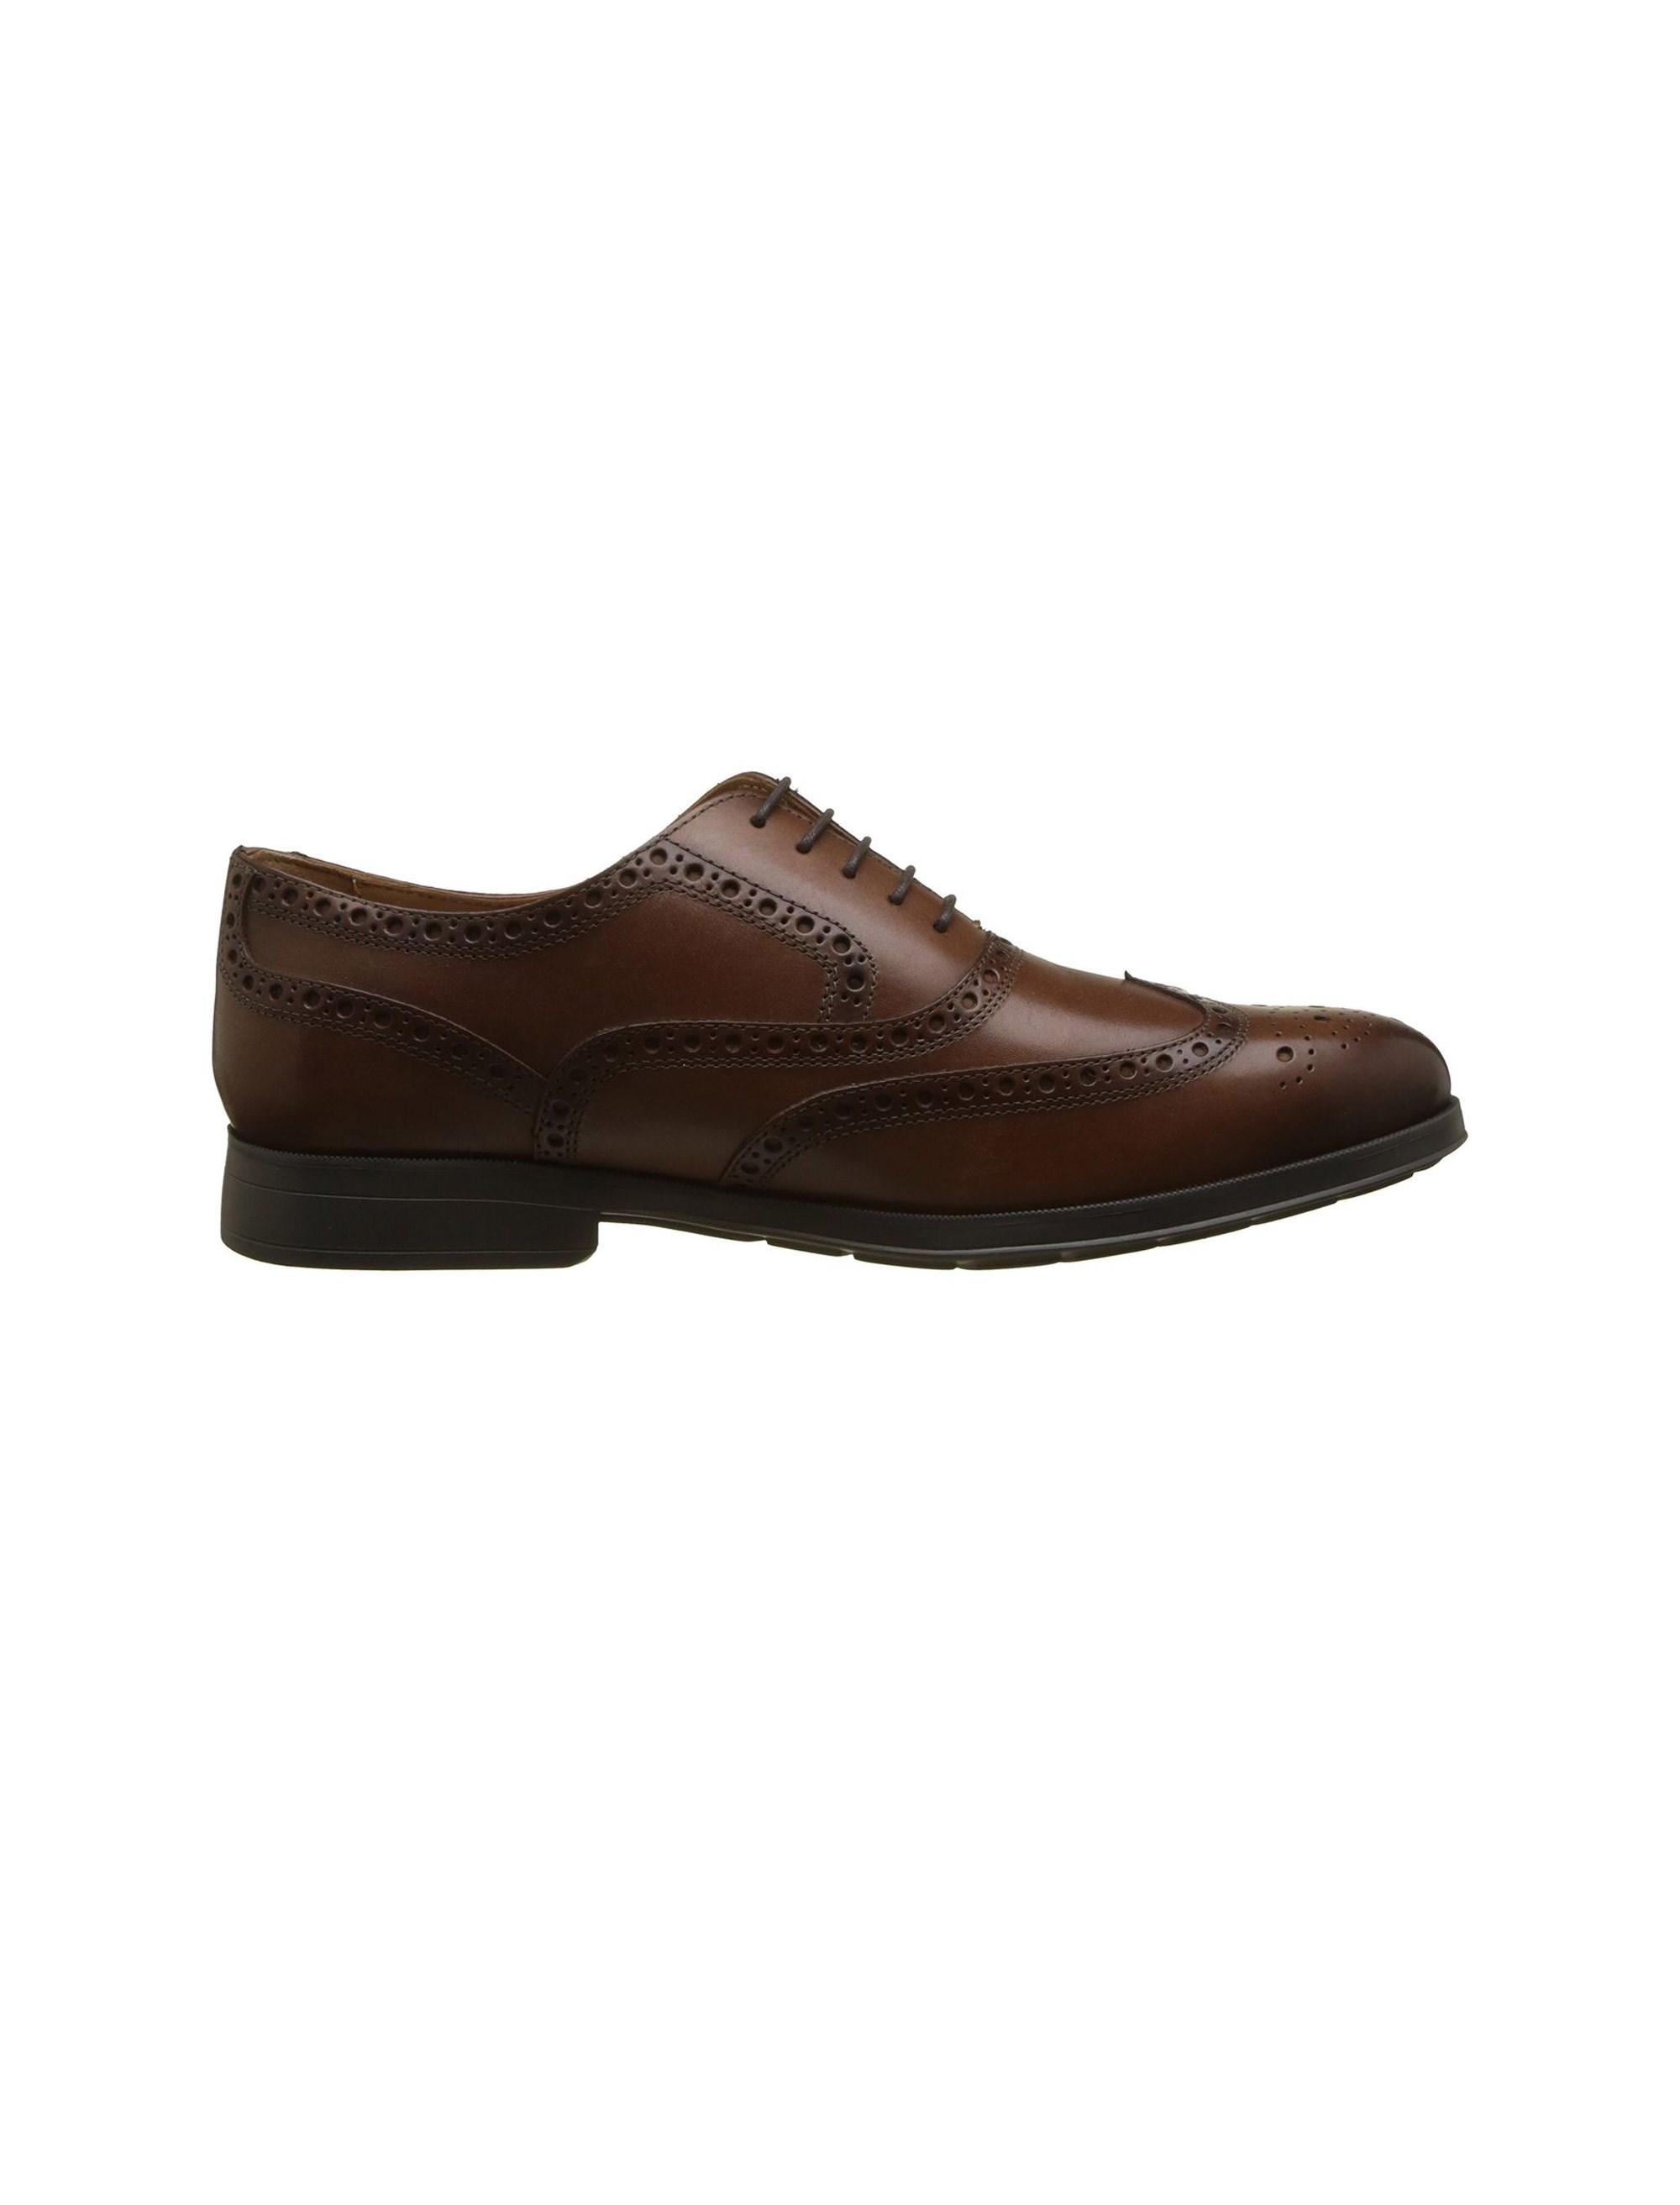 قیمت کفش اداری چرم مردانه Hilstone 2fit - جی اوکس